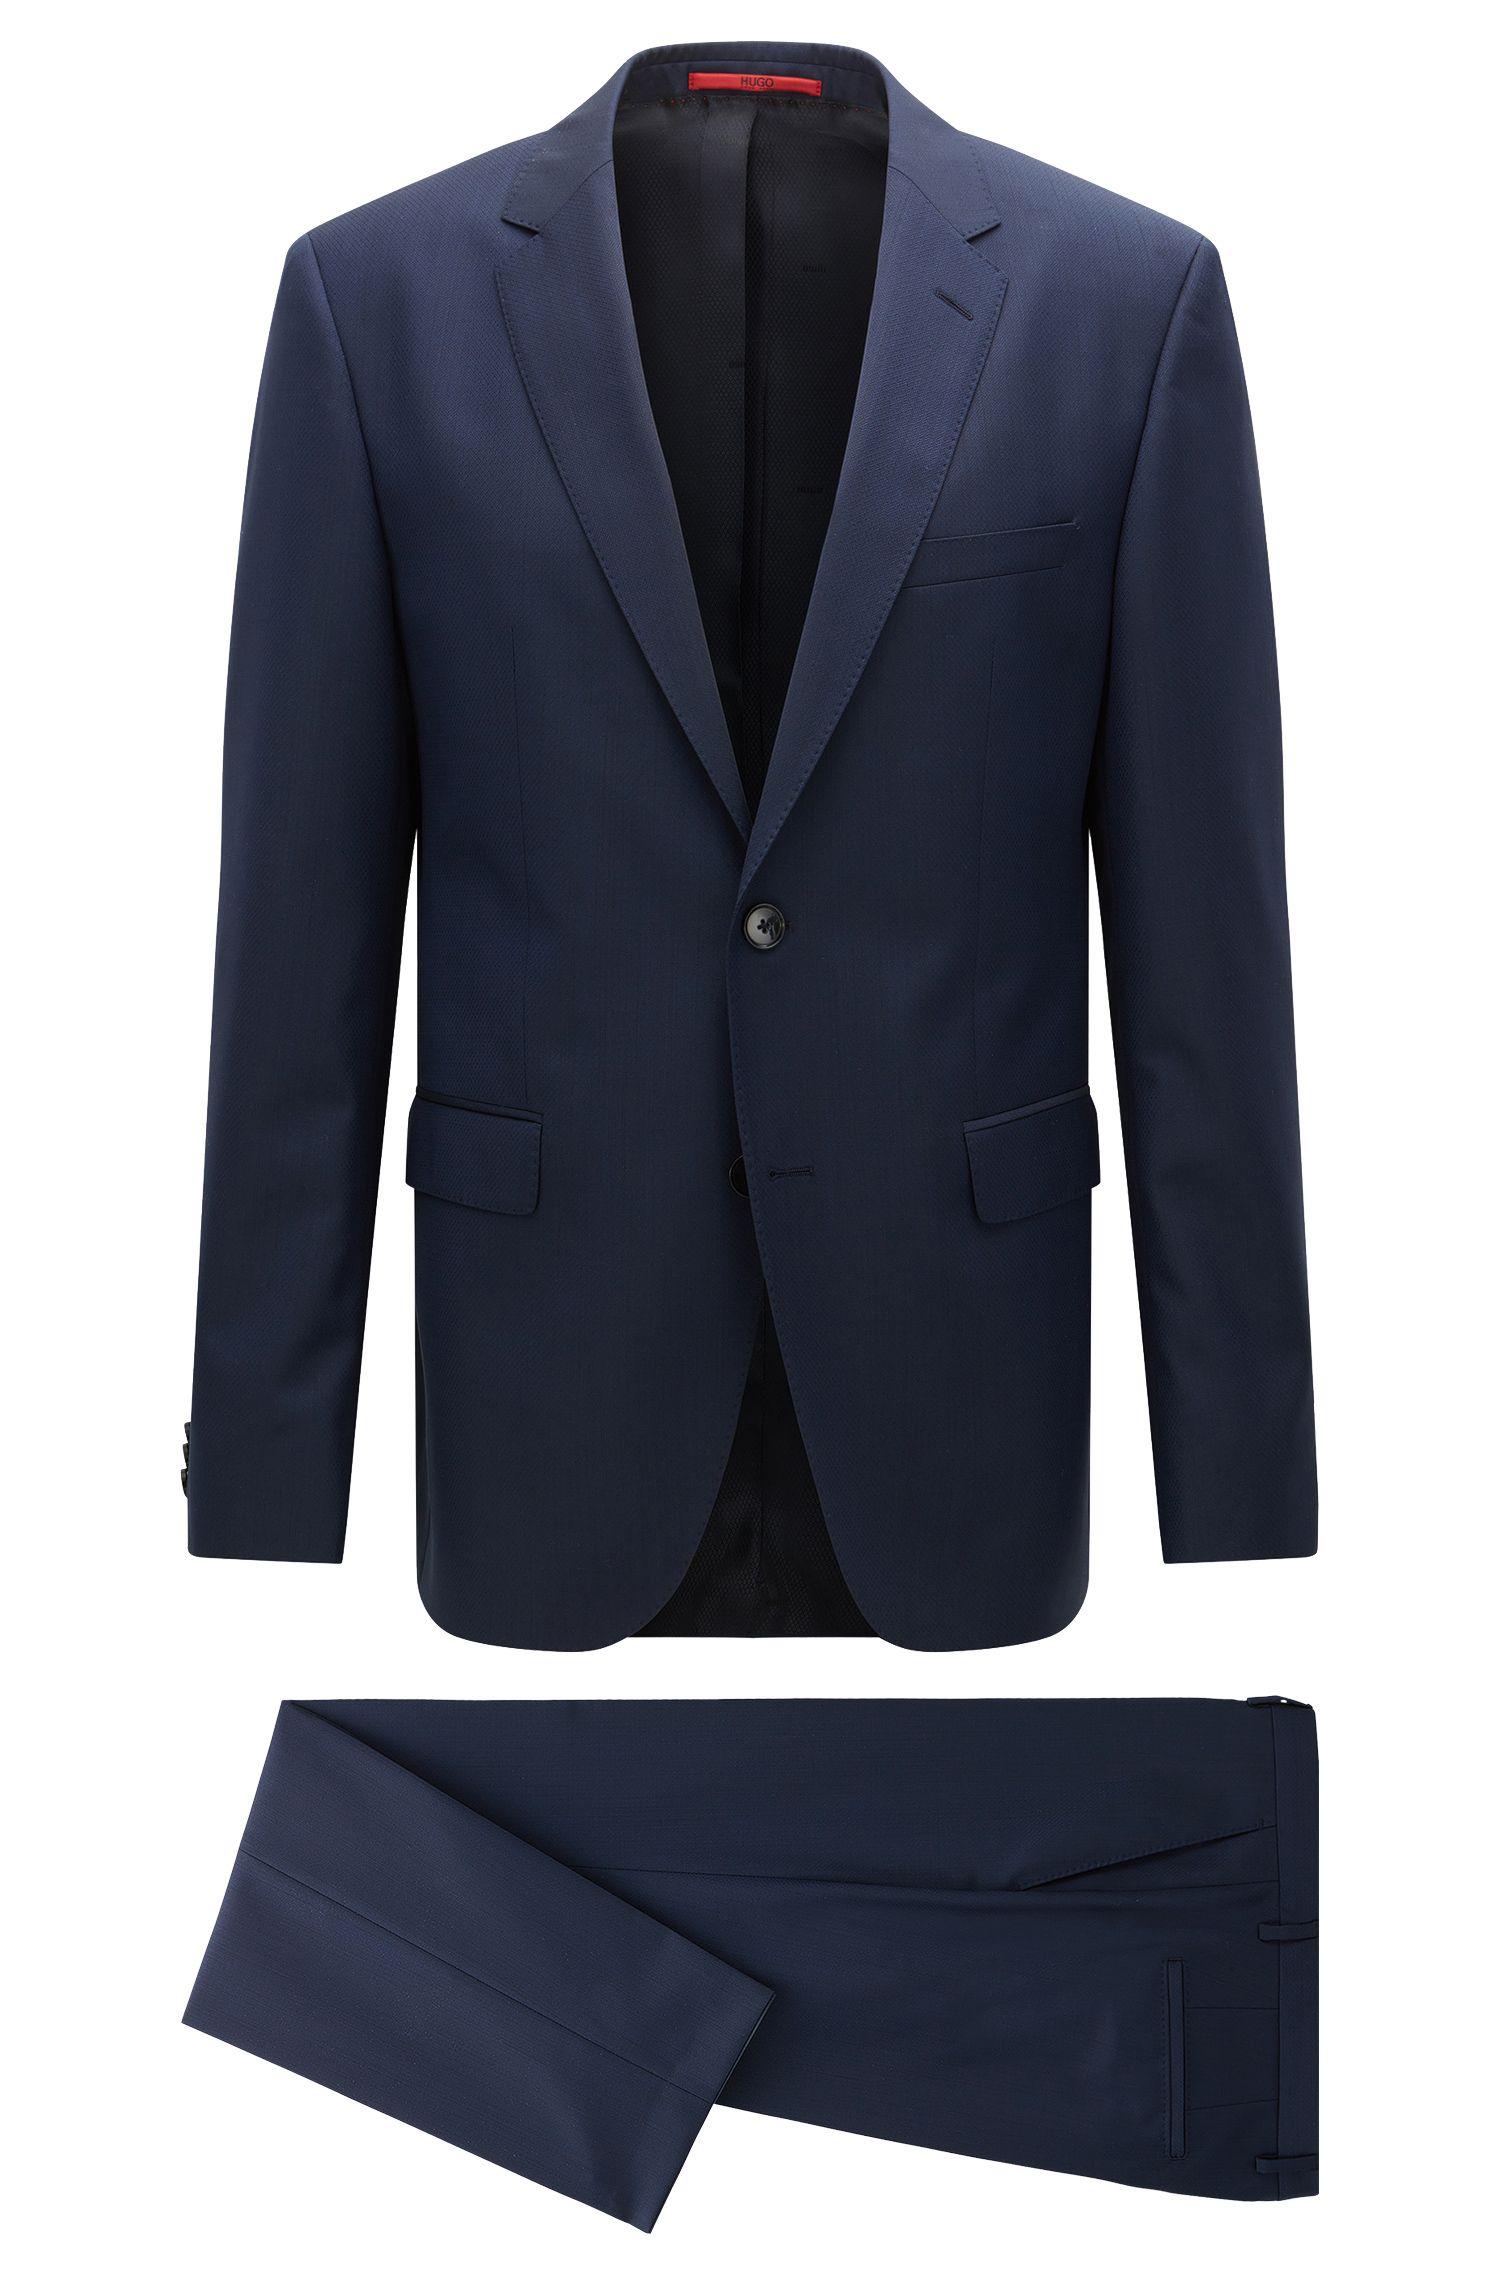 Regular-fit suit in a textured virgin wool blend